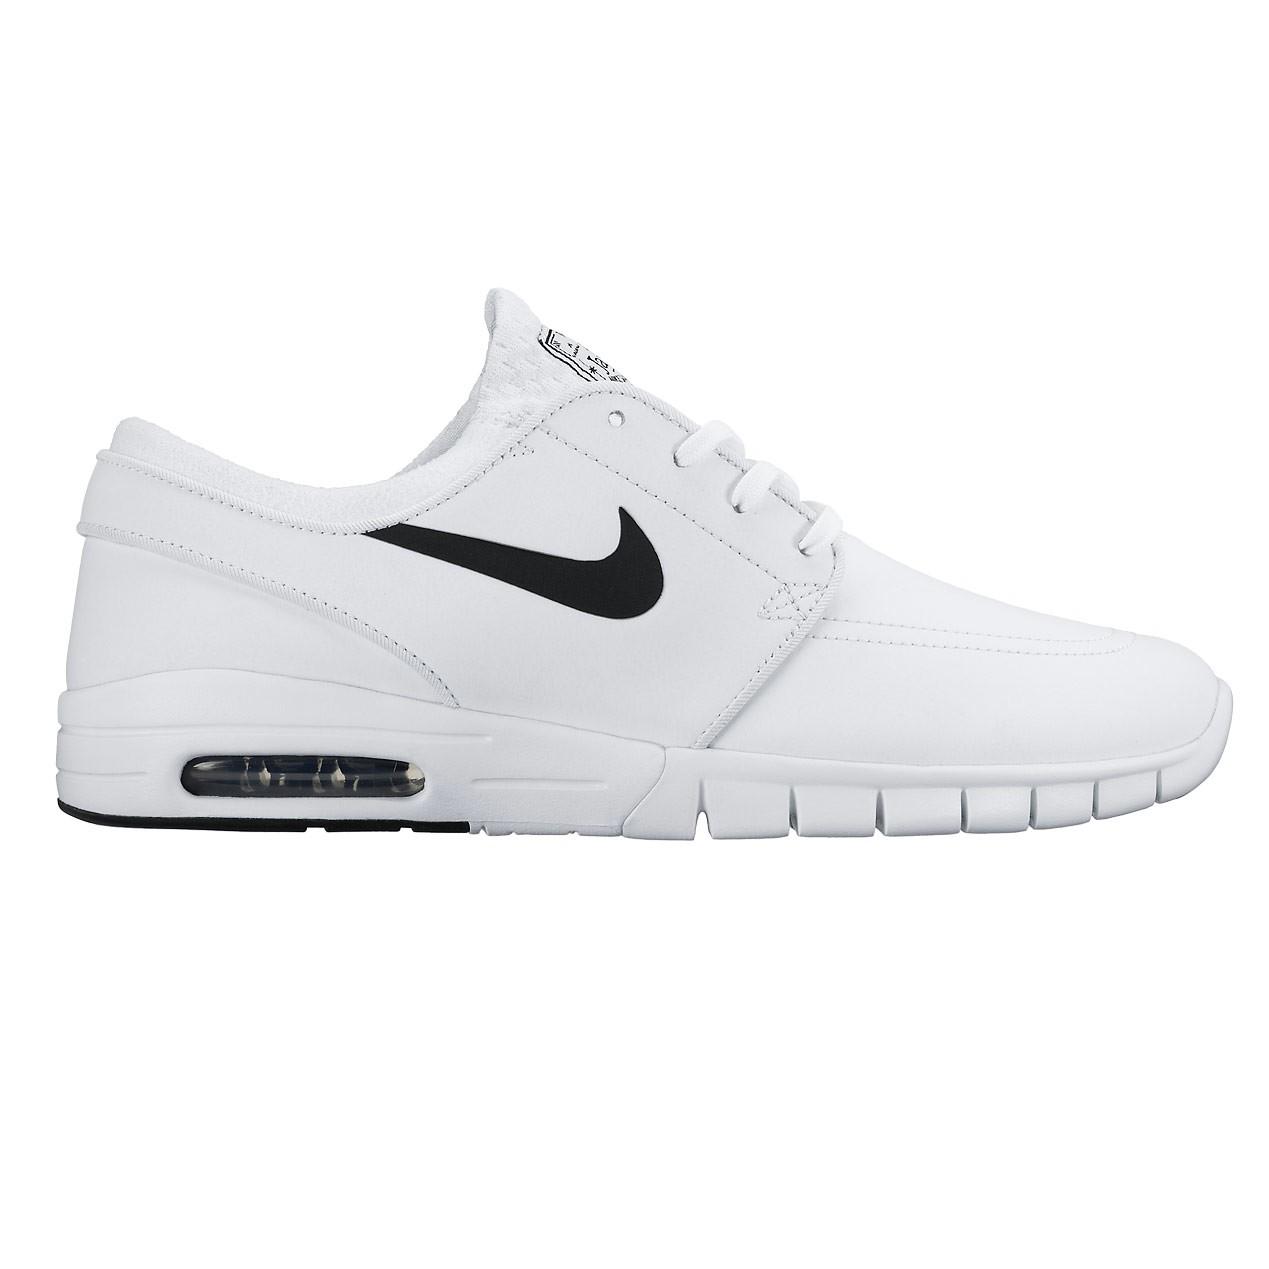 Tenisky Nike SB Stefan Janoski Max Suede white/black